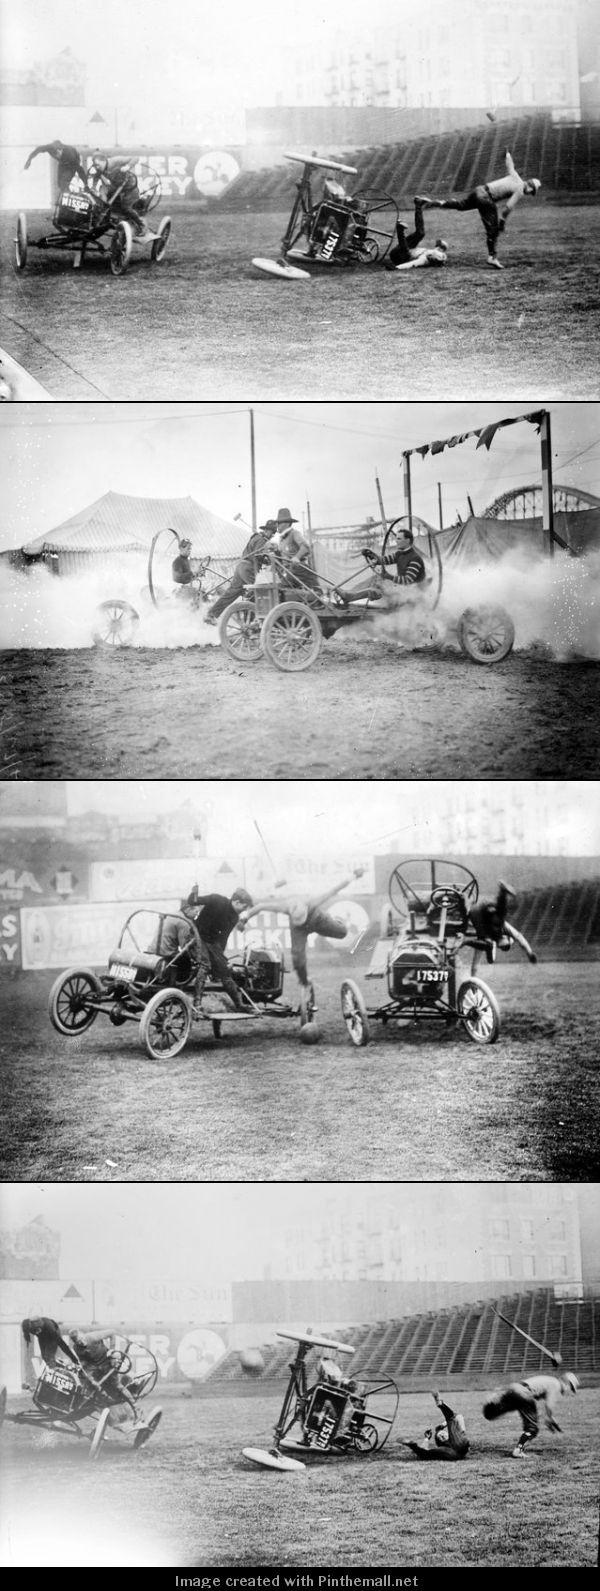 AUTO POLO: c.1910s - Automobile polo or Auto polo was a motorsport ...